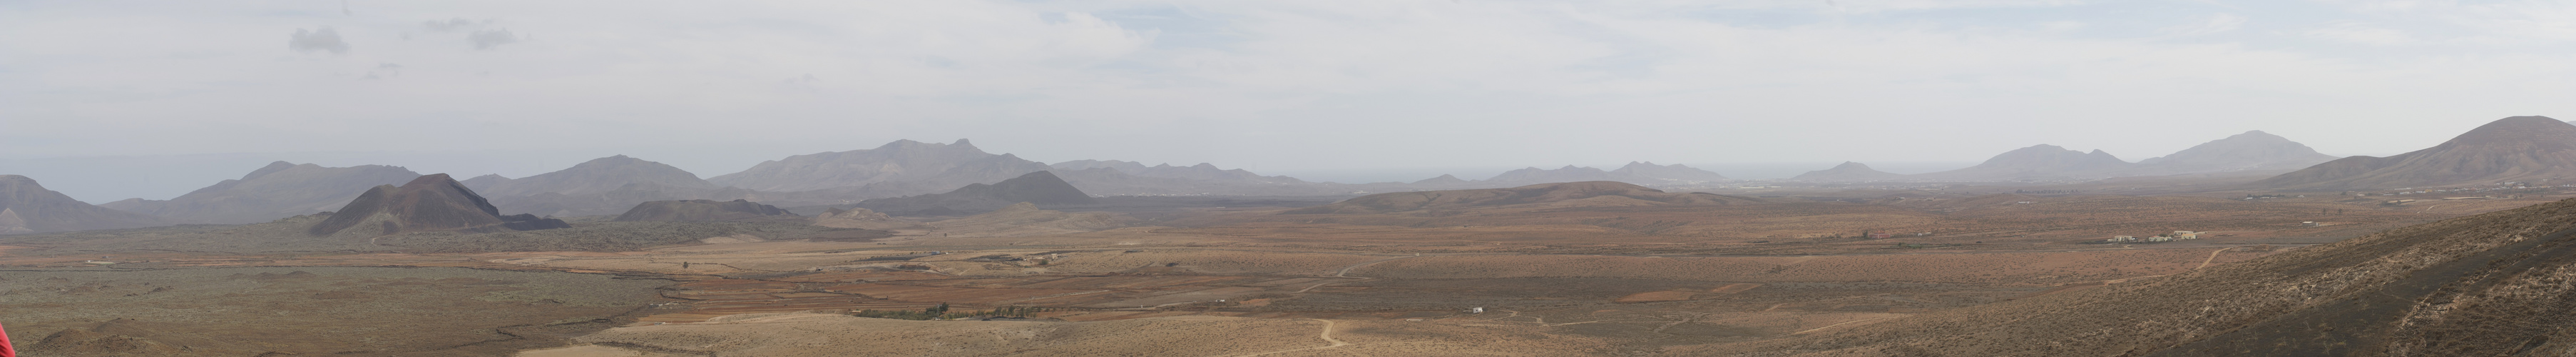 panorama de volcanes